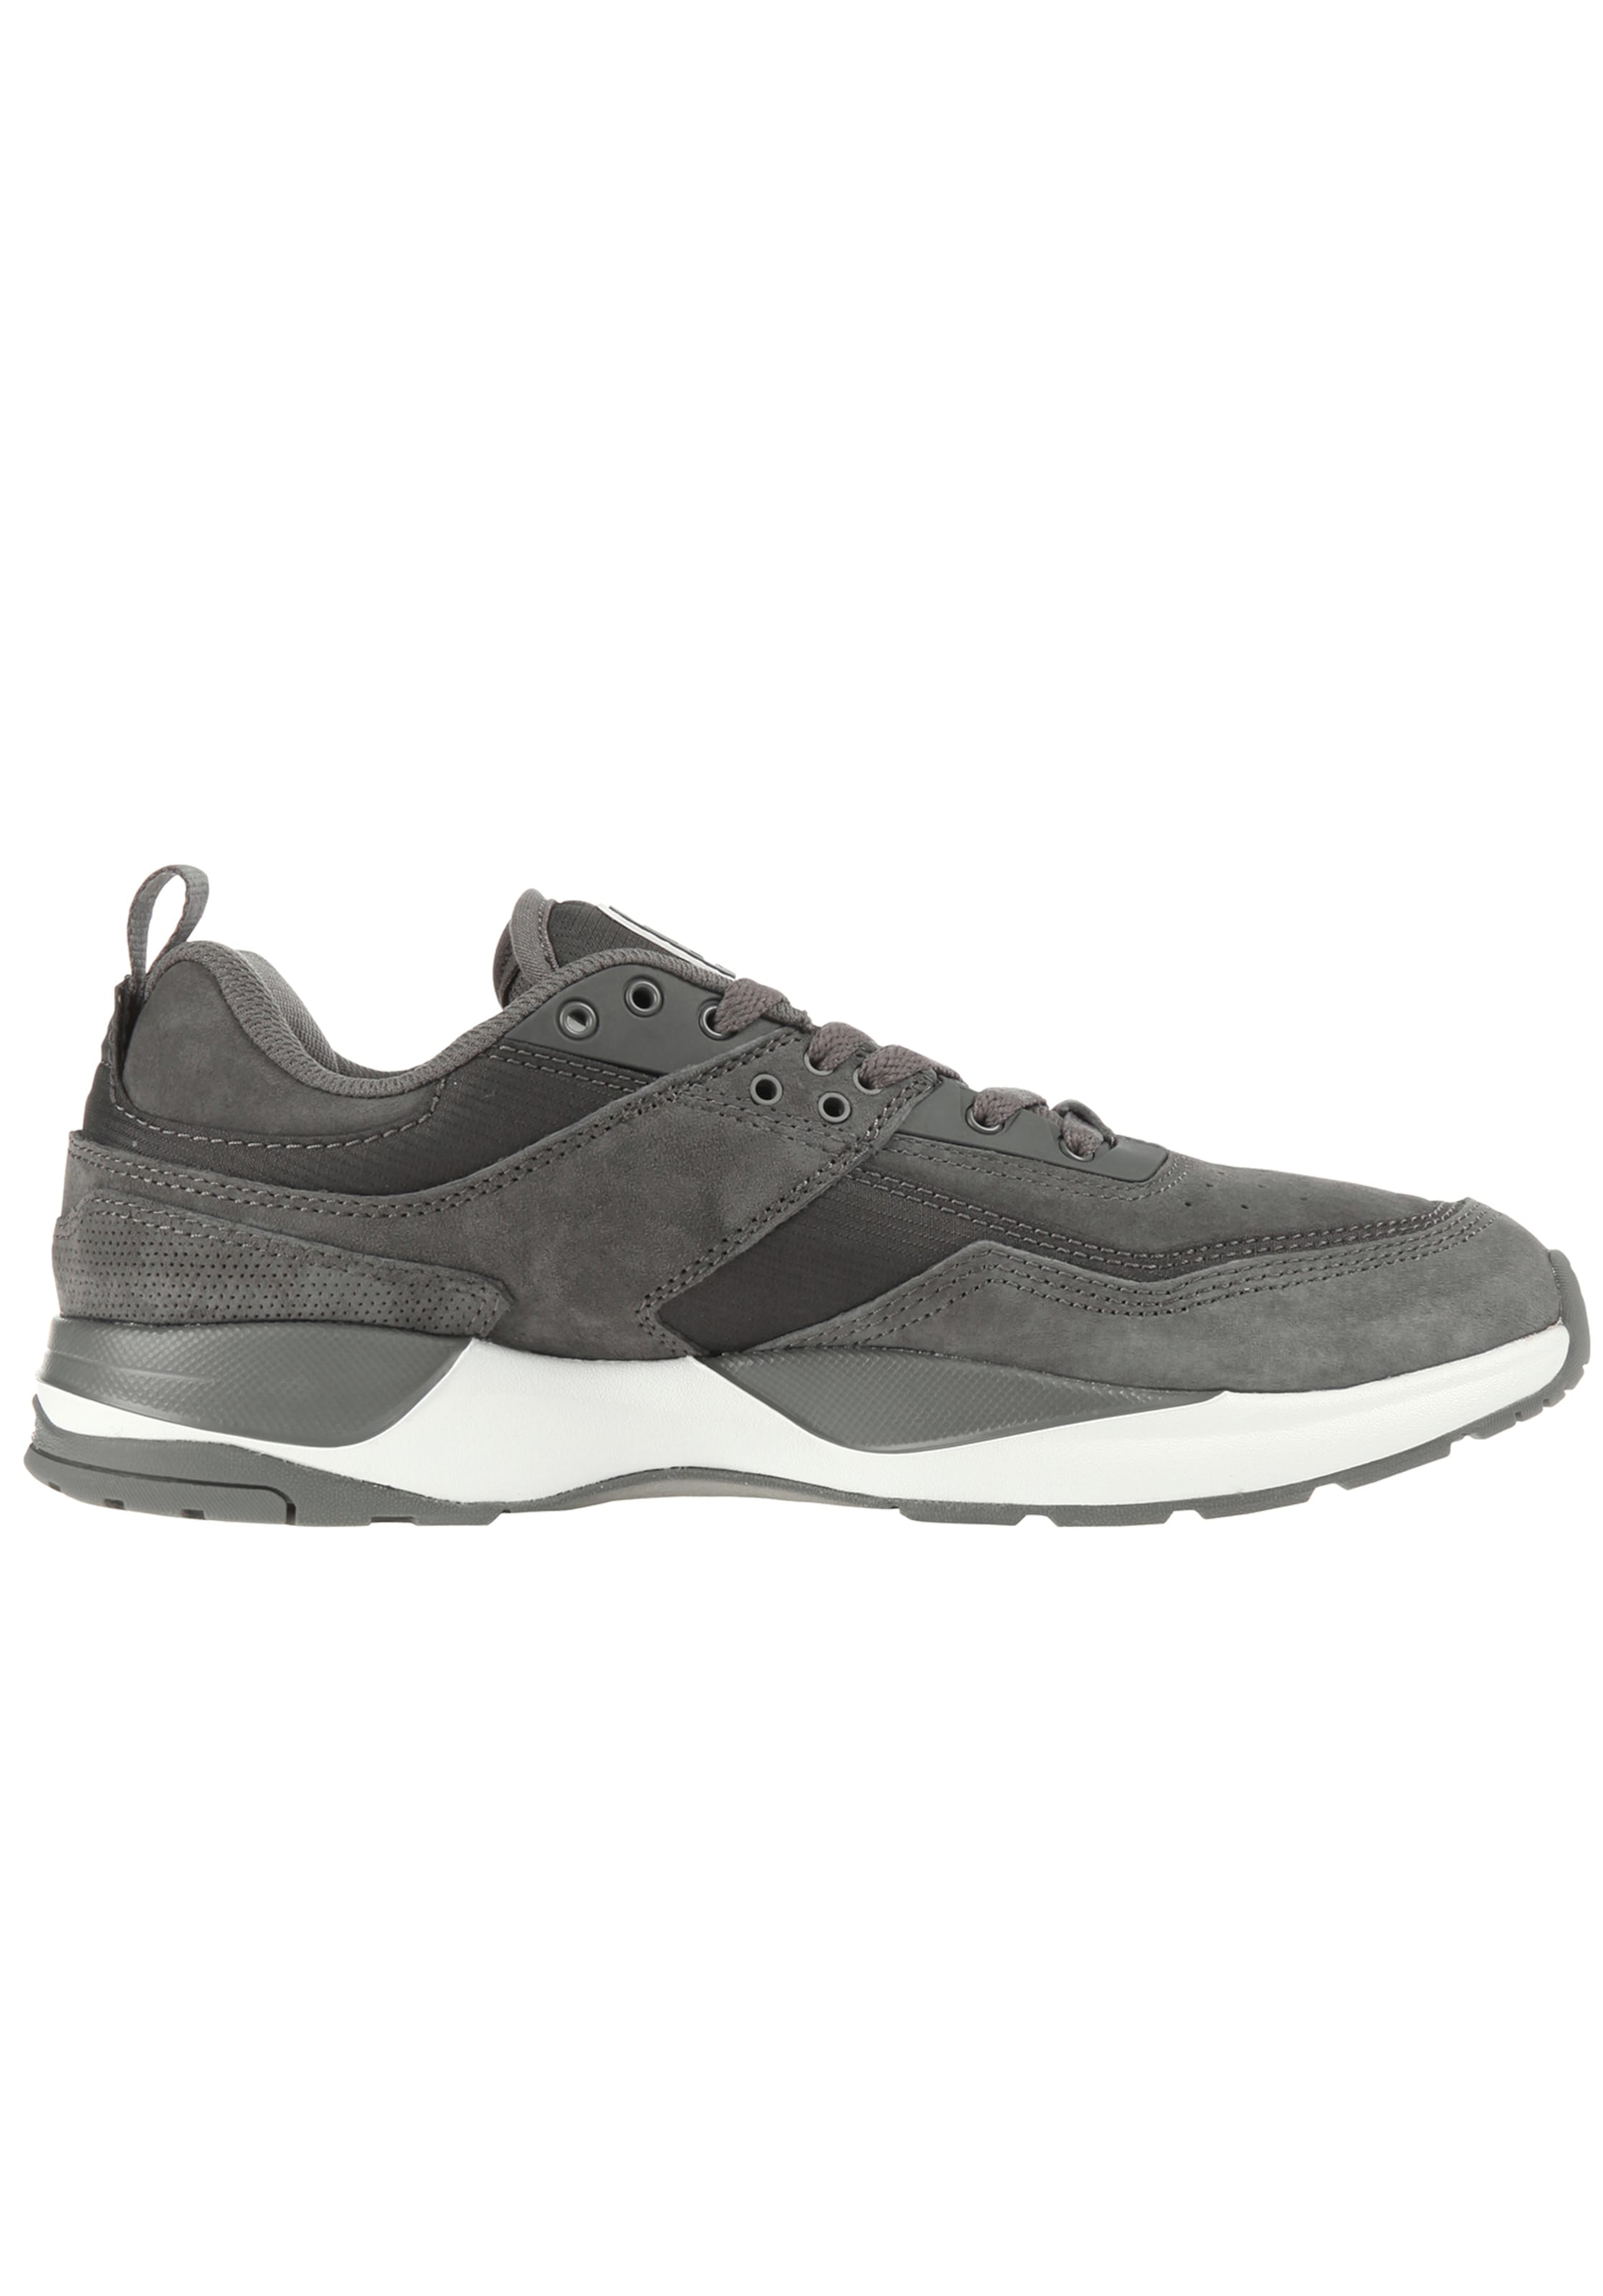 Sneaker Dunkelgrau In Shoes Dc 'e tribeka' Yfgb7yv6